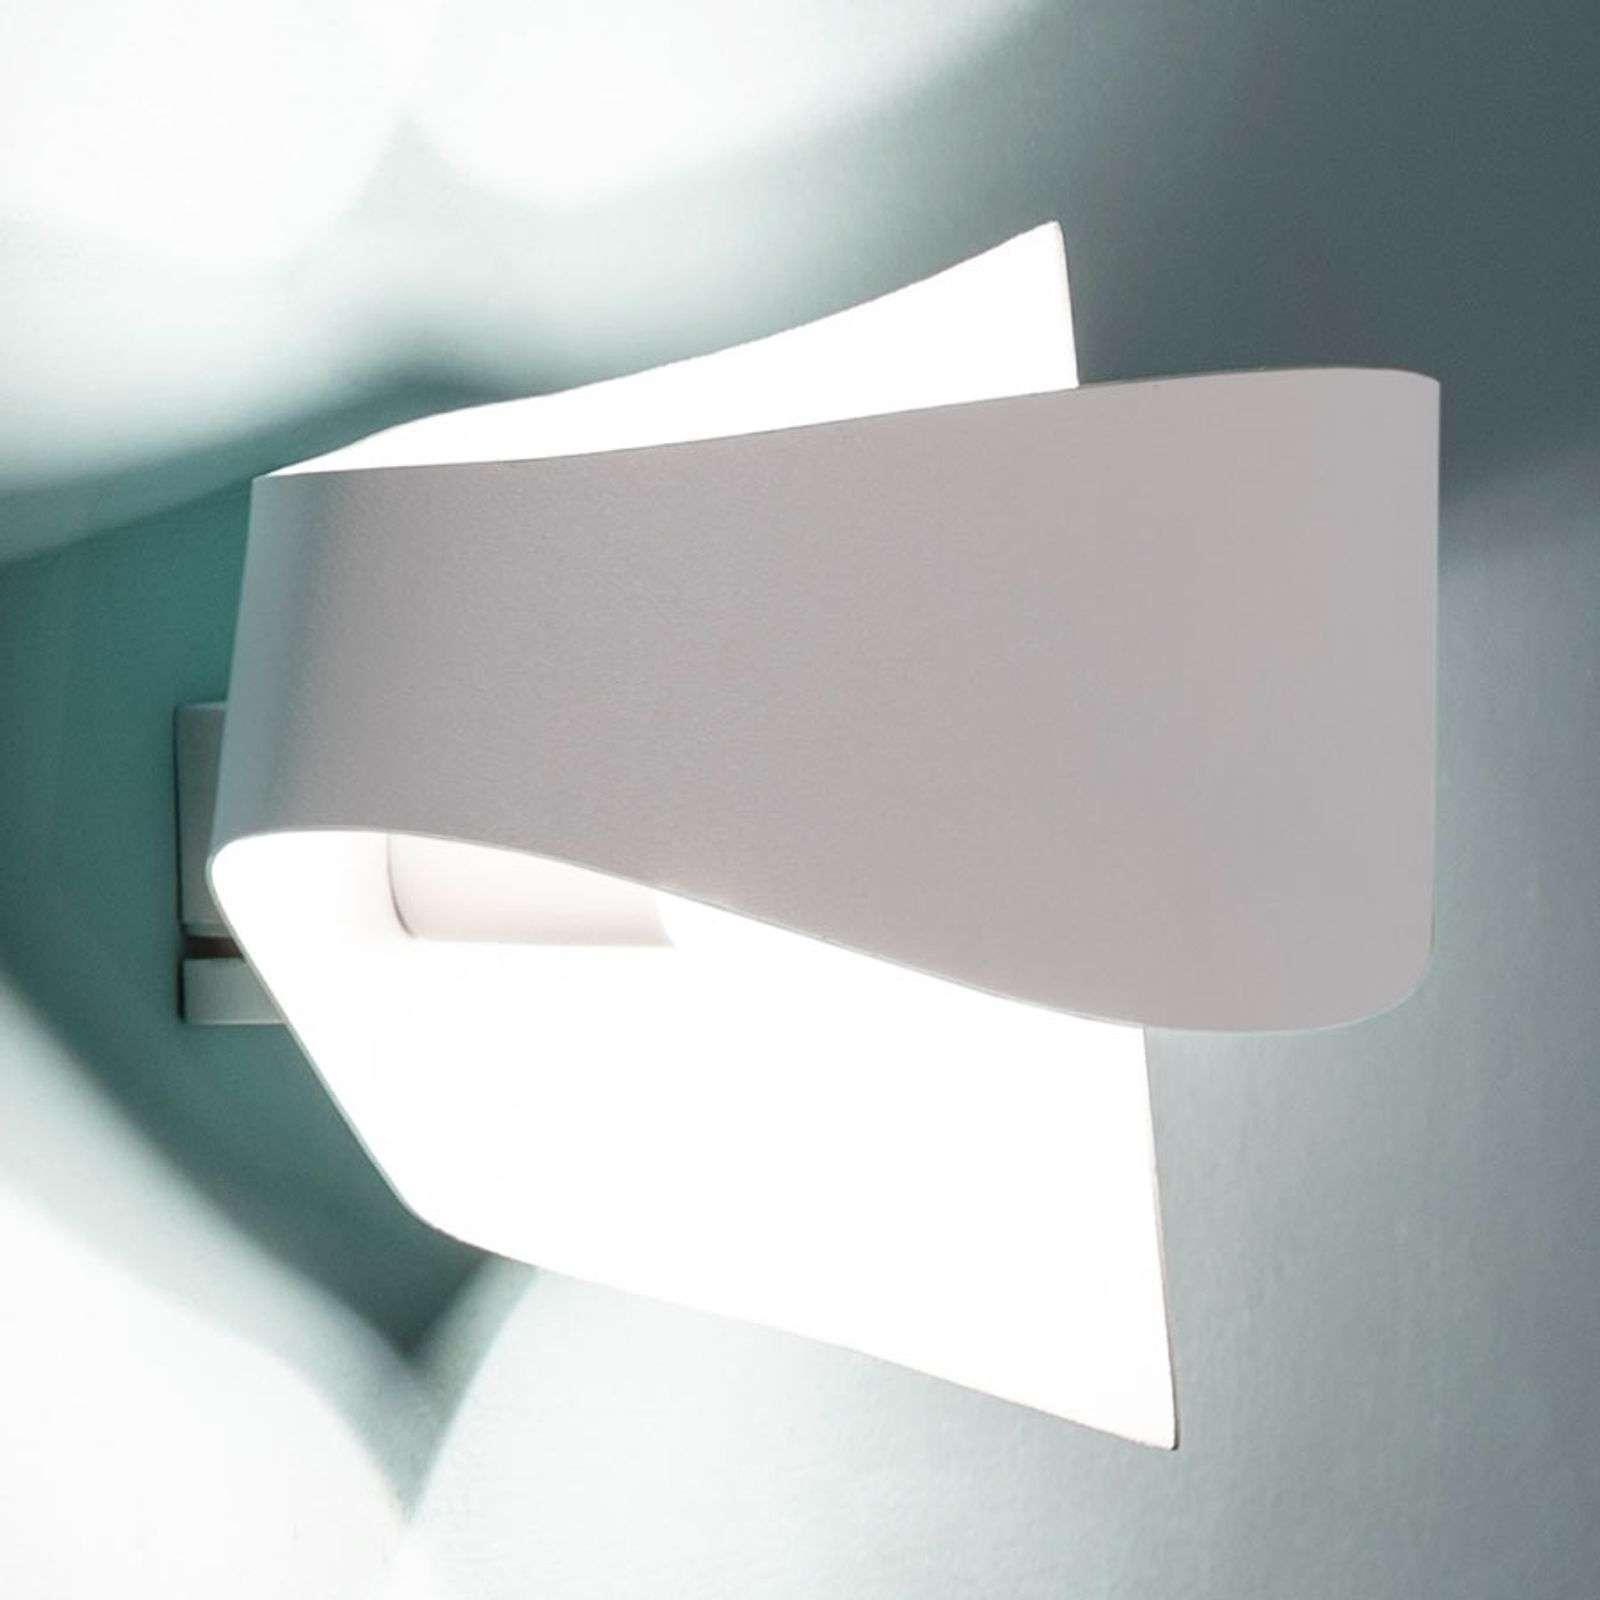 Full Size of Schlafzimmer Wandlampe Wandlampen Schwenkbar Modern Wandleuchte Dimmbar Design Mit Leselampe Ikea Led Holz Schalter Deckenleuchte Landhausstil Bad Komplett Schlafzimmer Schlafzimmer Wandlampe